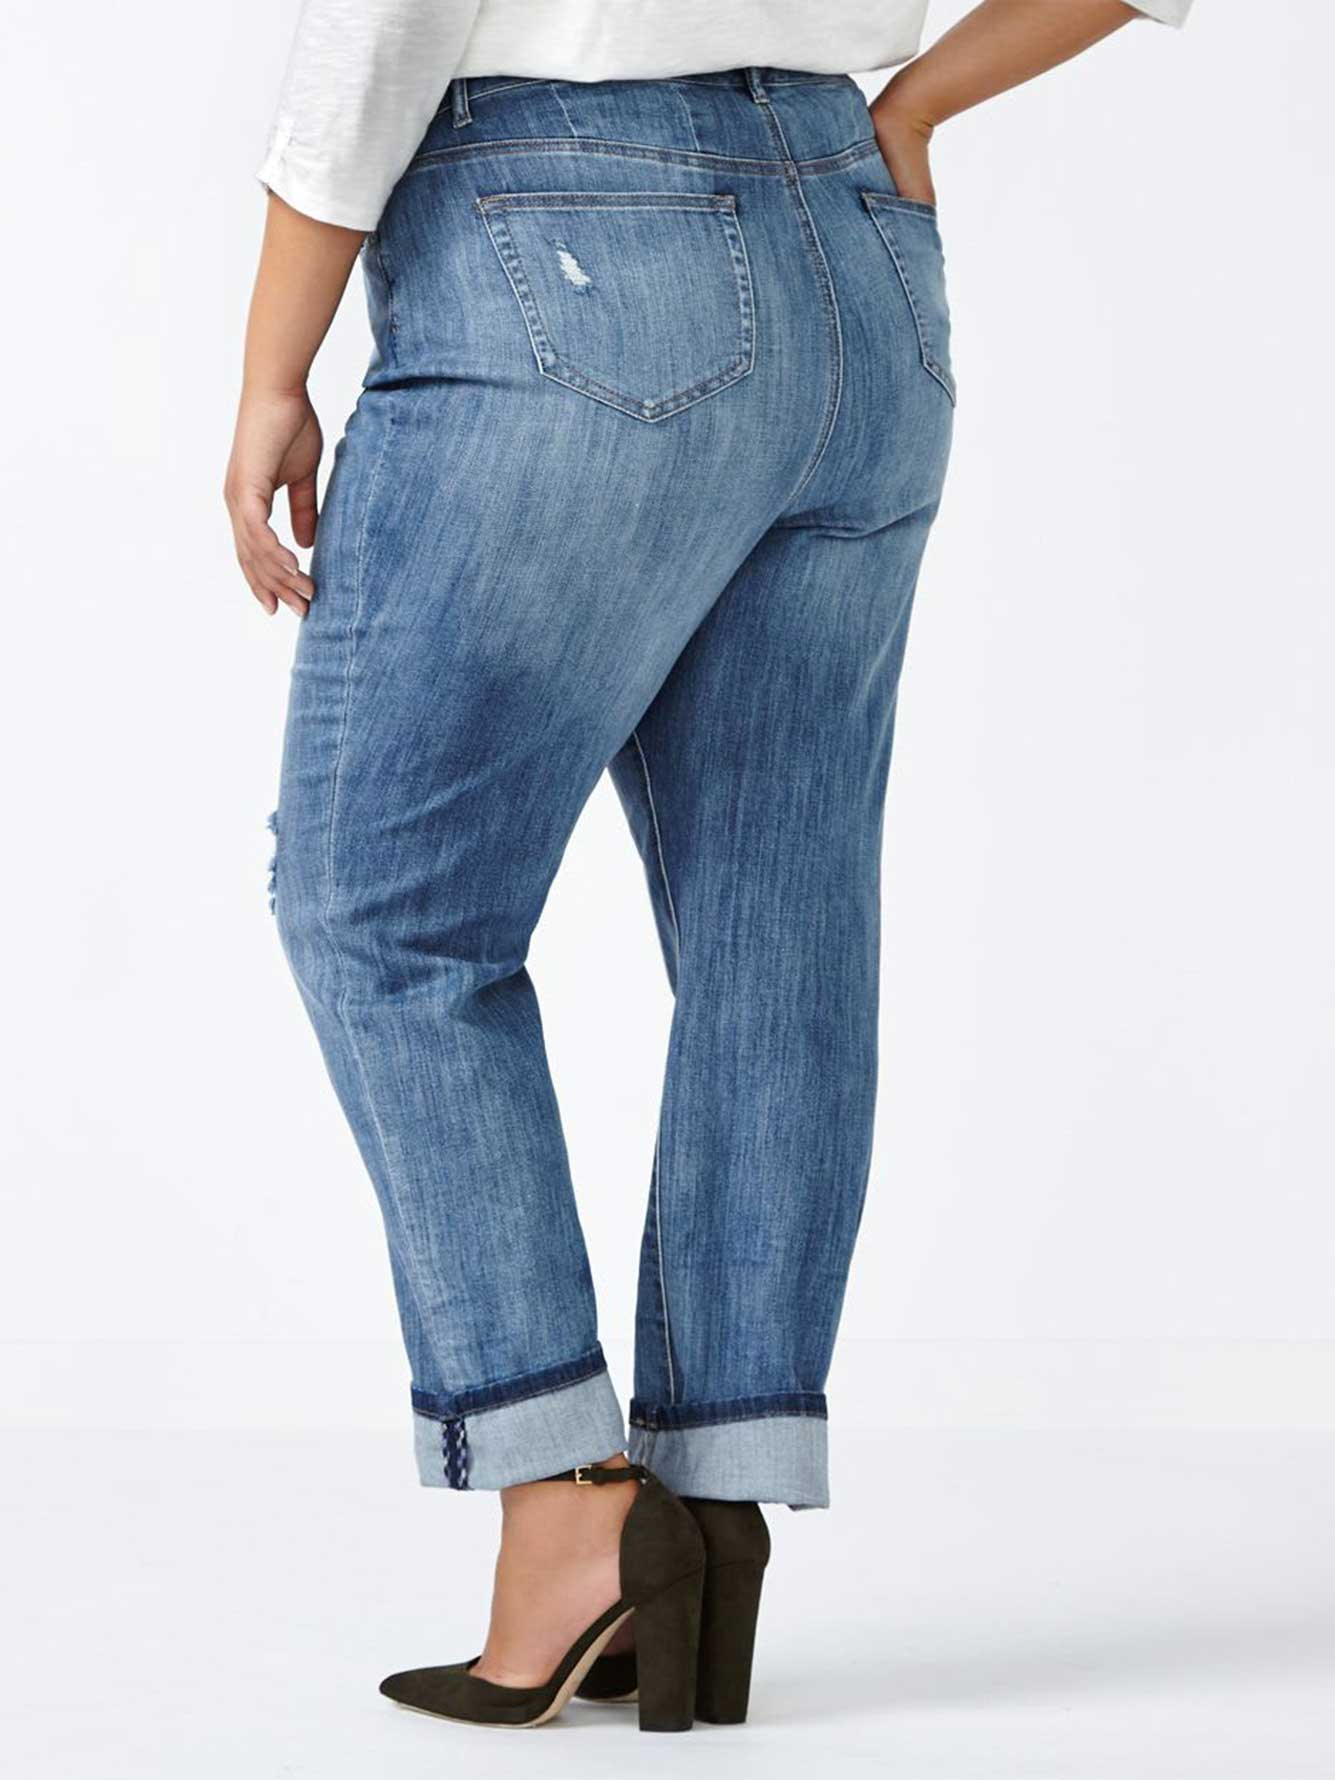 online only d c jeans curvy fit boyfriend jean penningtons. Black Bedroom Furniture Sets. Home Design Ideas